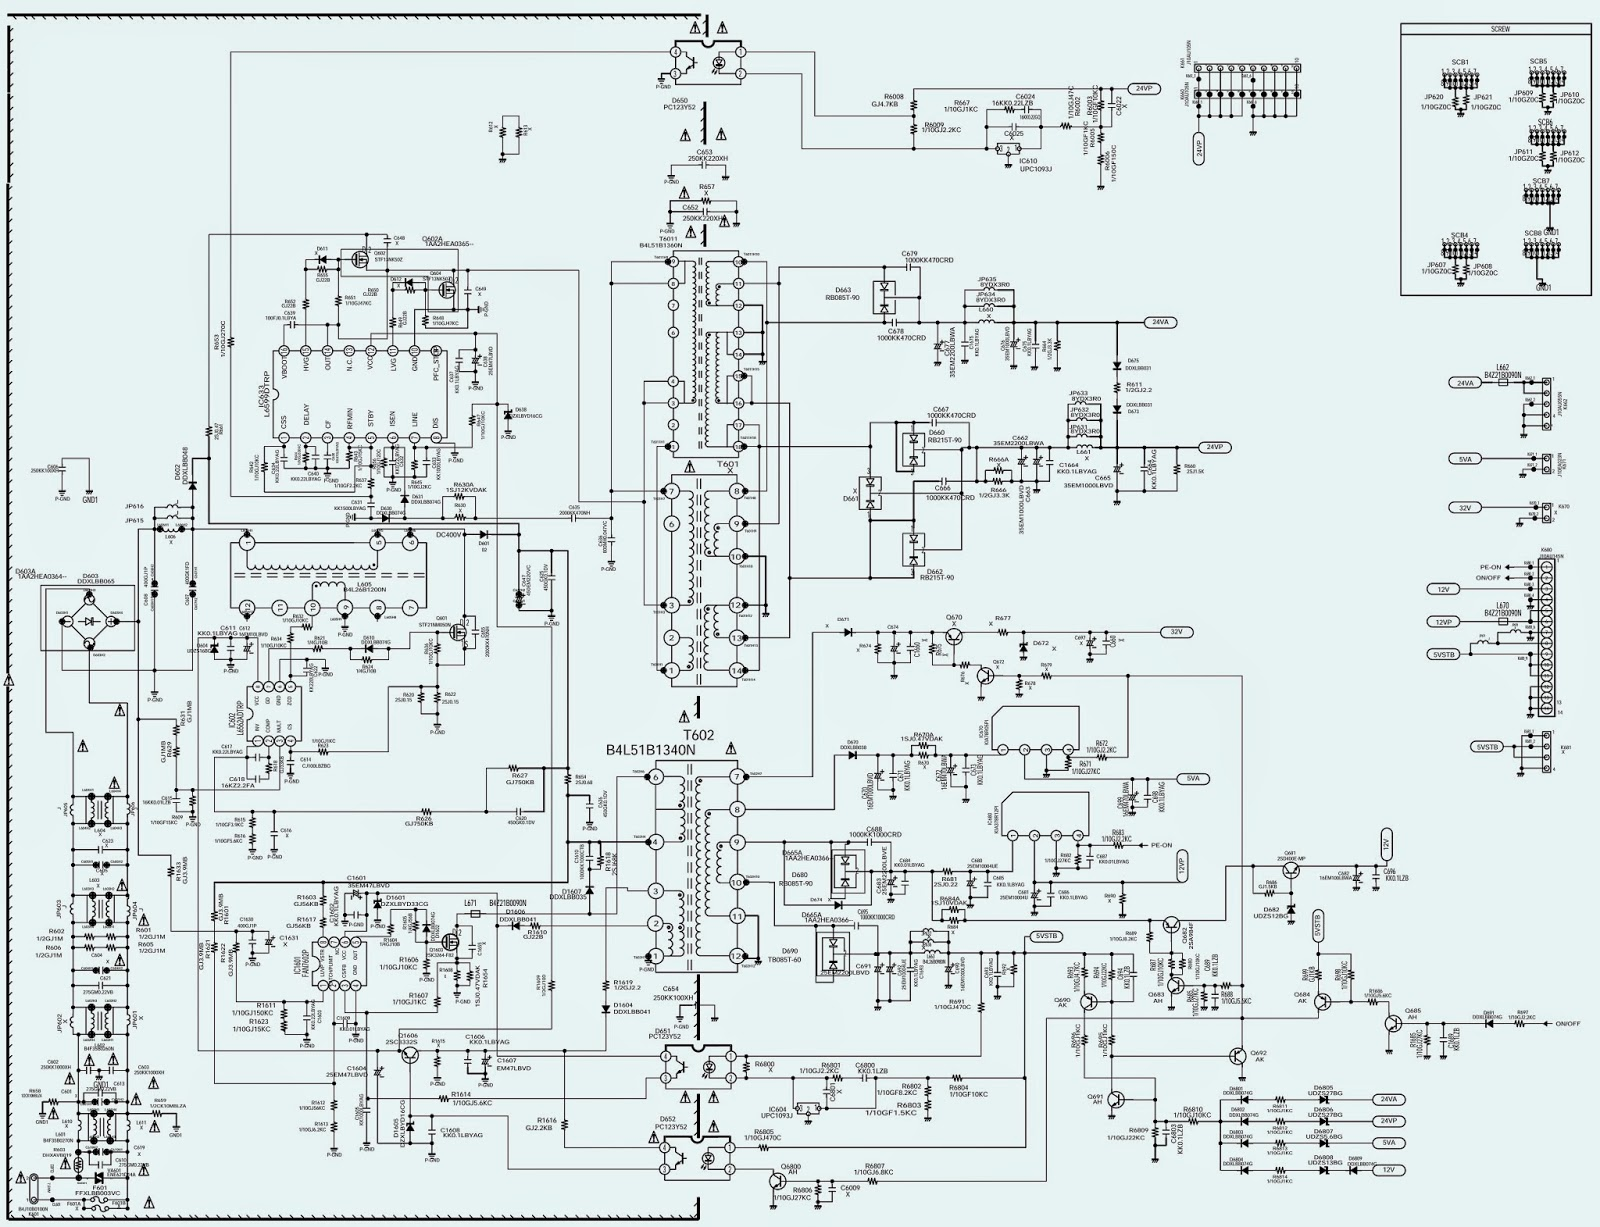 ELECTRONIC EQUIPMENT REPAIR CENTRE : SANYO LCD-42XF6